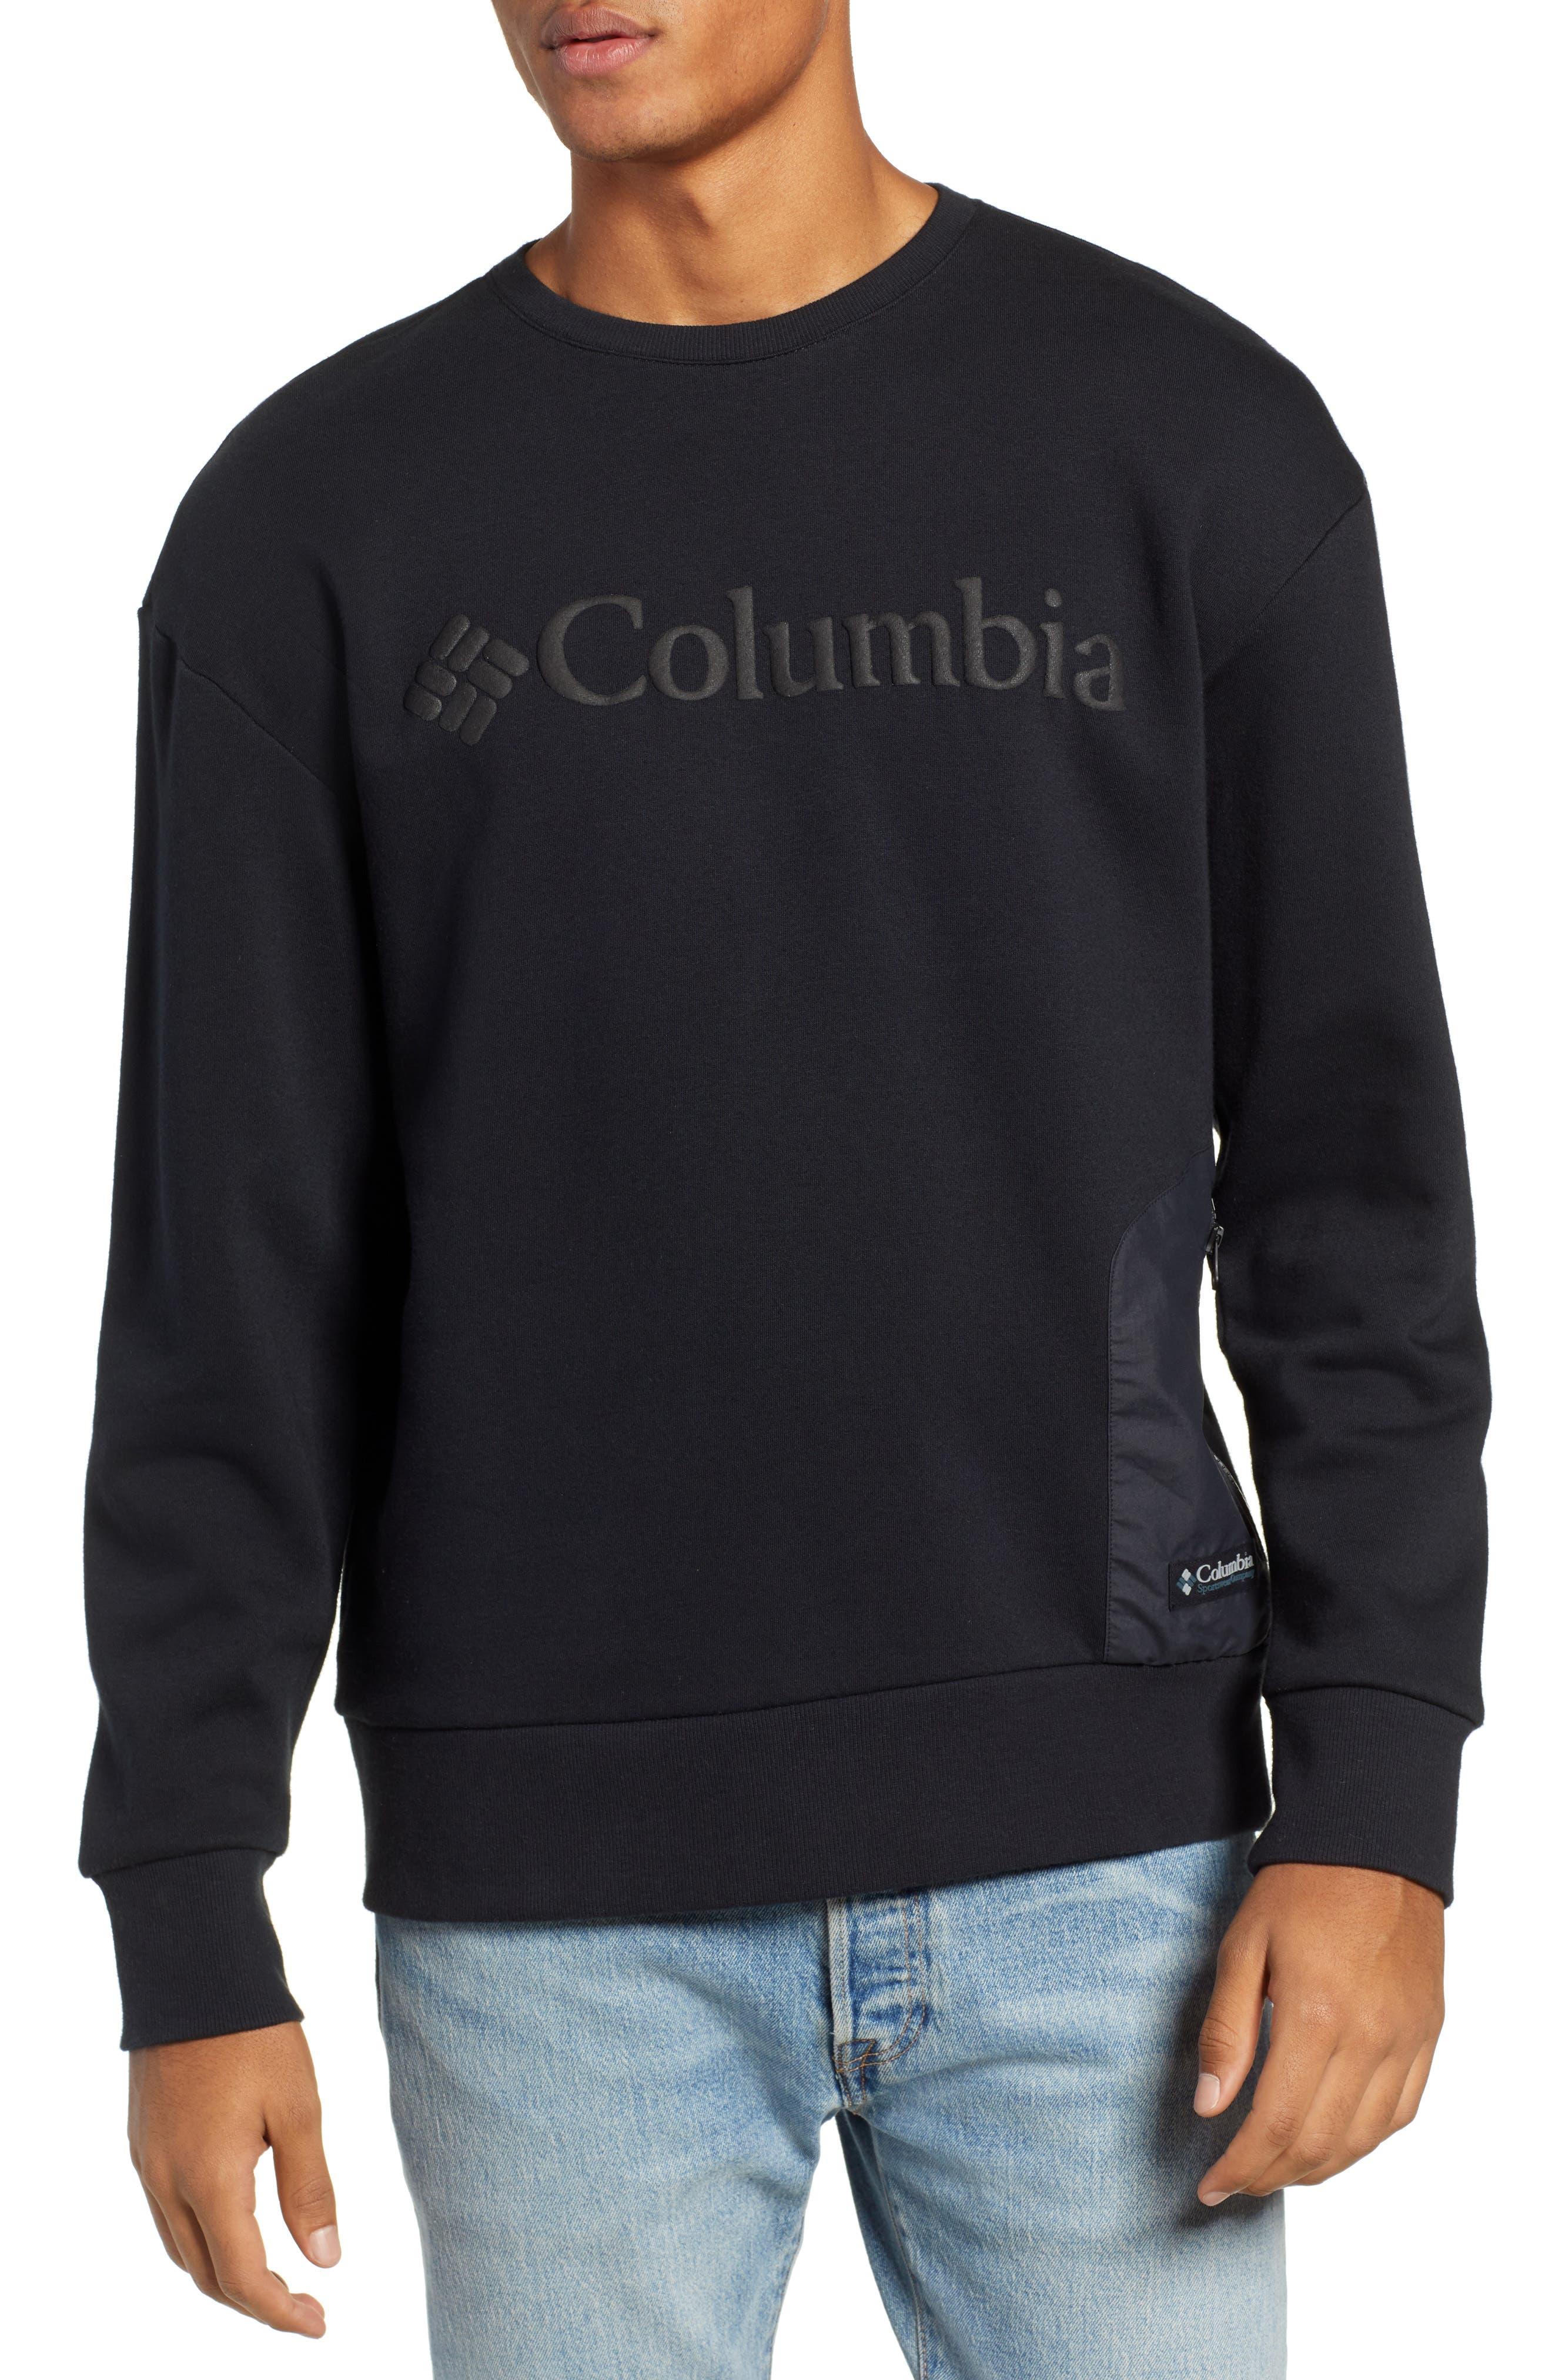 Bugasweat Crewneck Sweatshirt,                         Main,                         color, BLACK